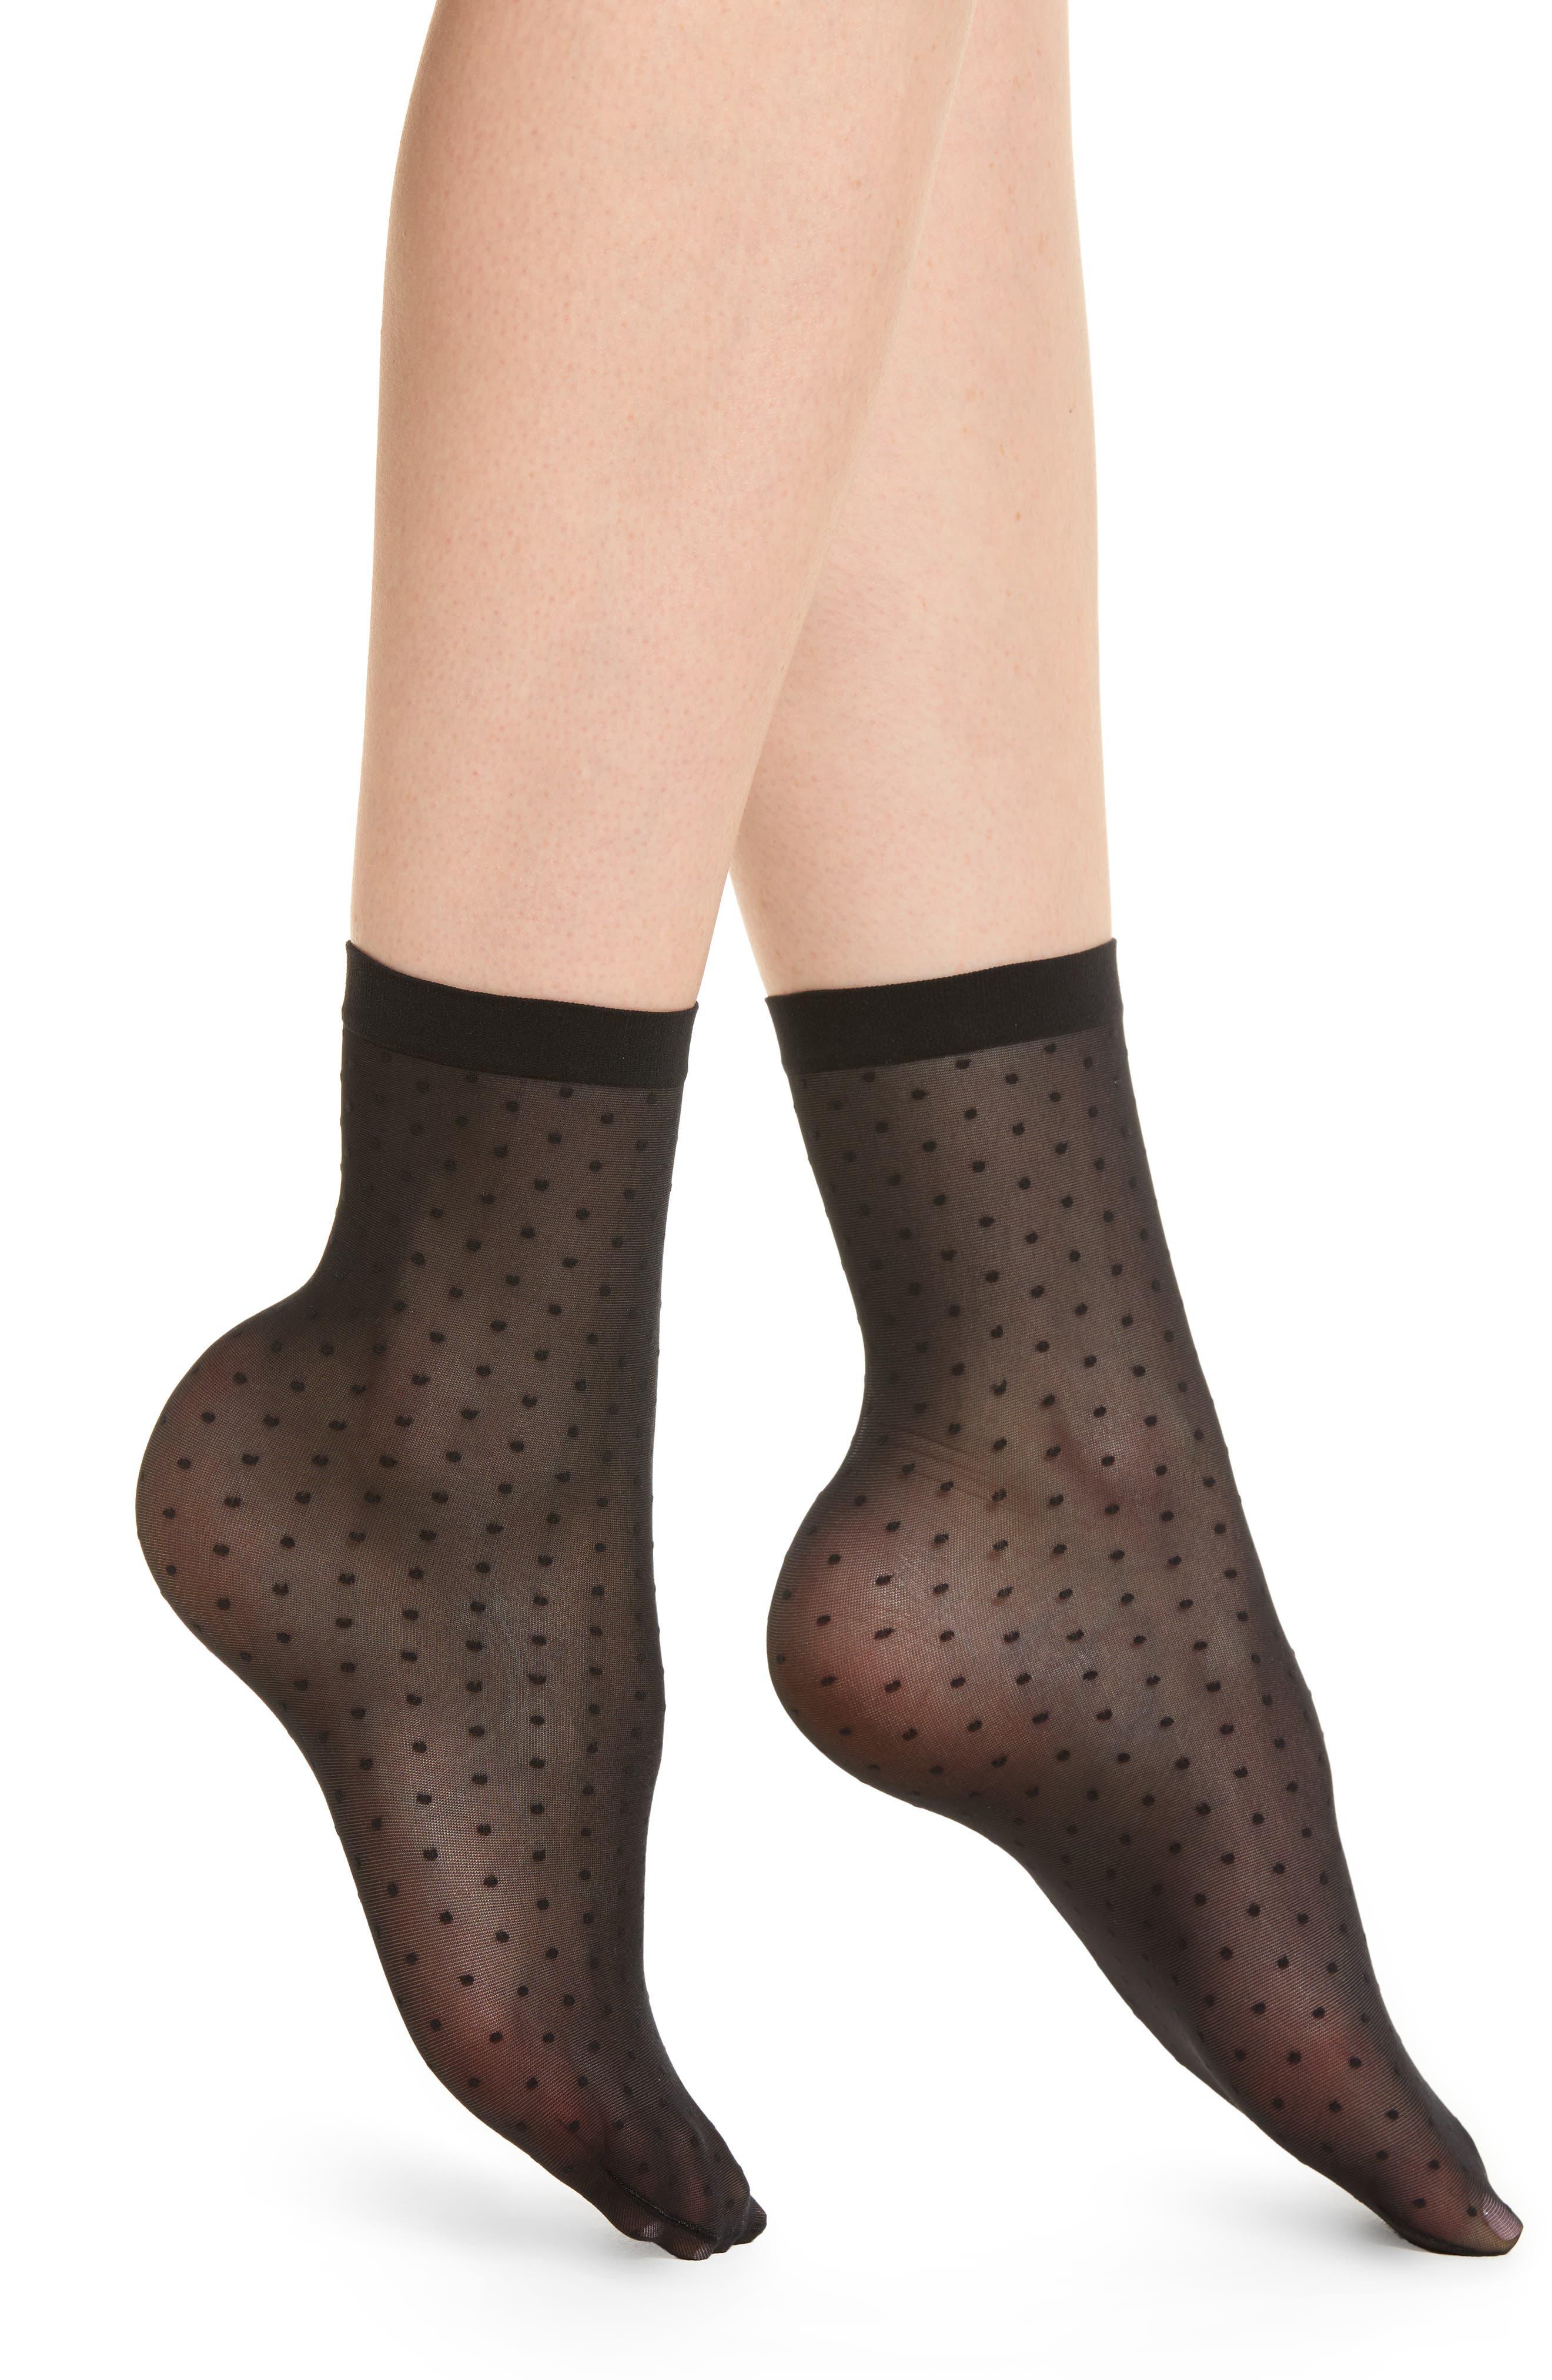 Sarah Jessica Sheer Socks,                             Main thumbnail 1, color,                             Black